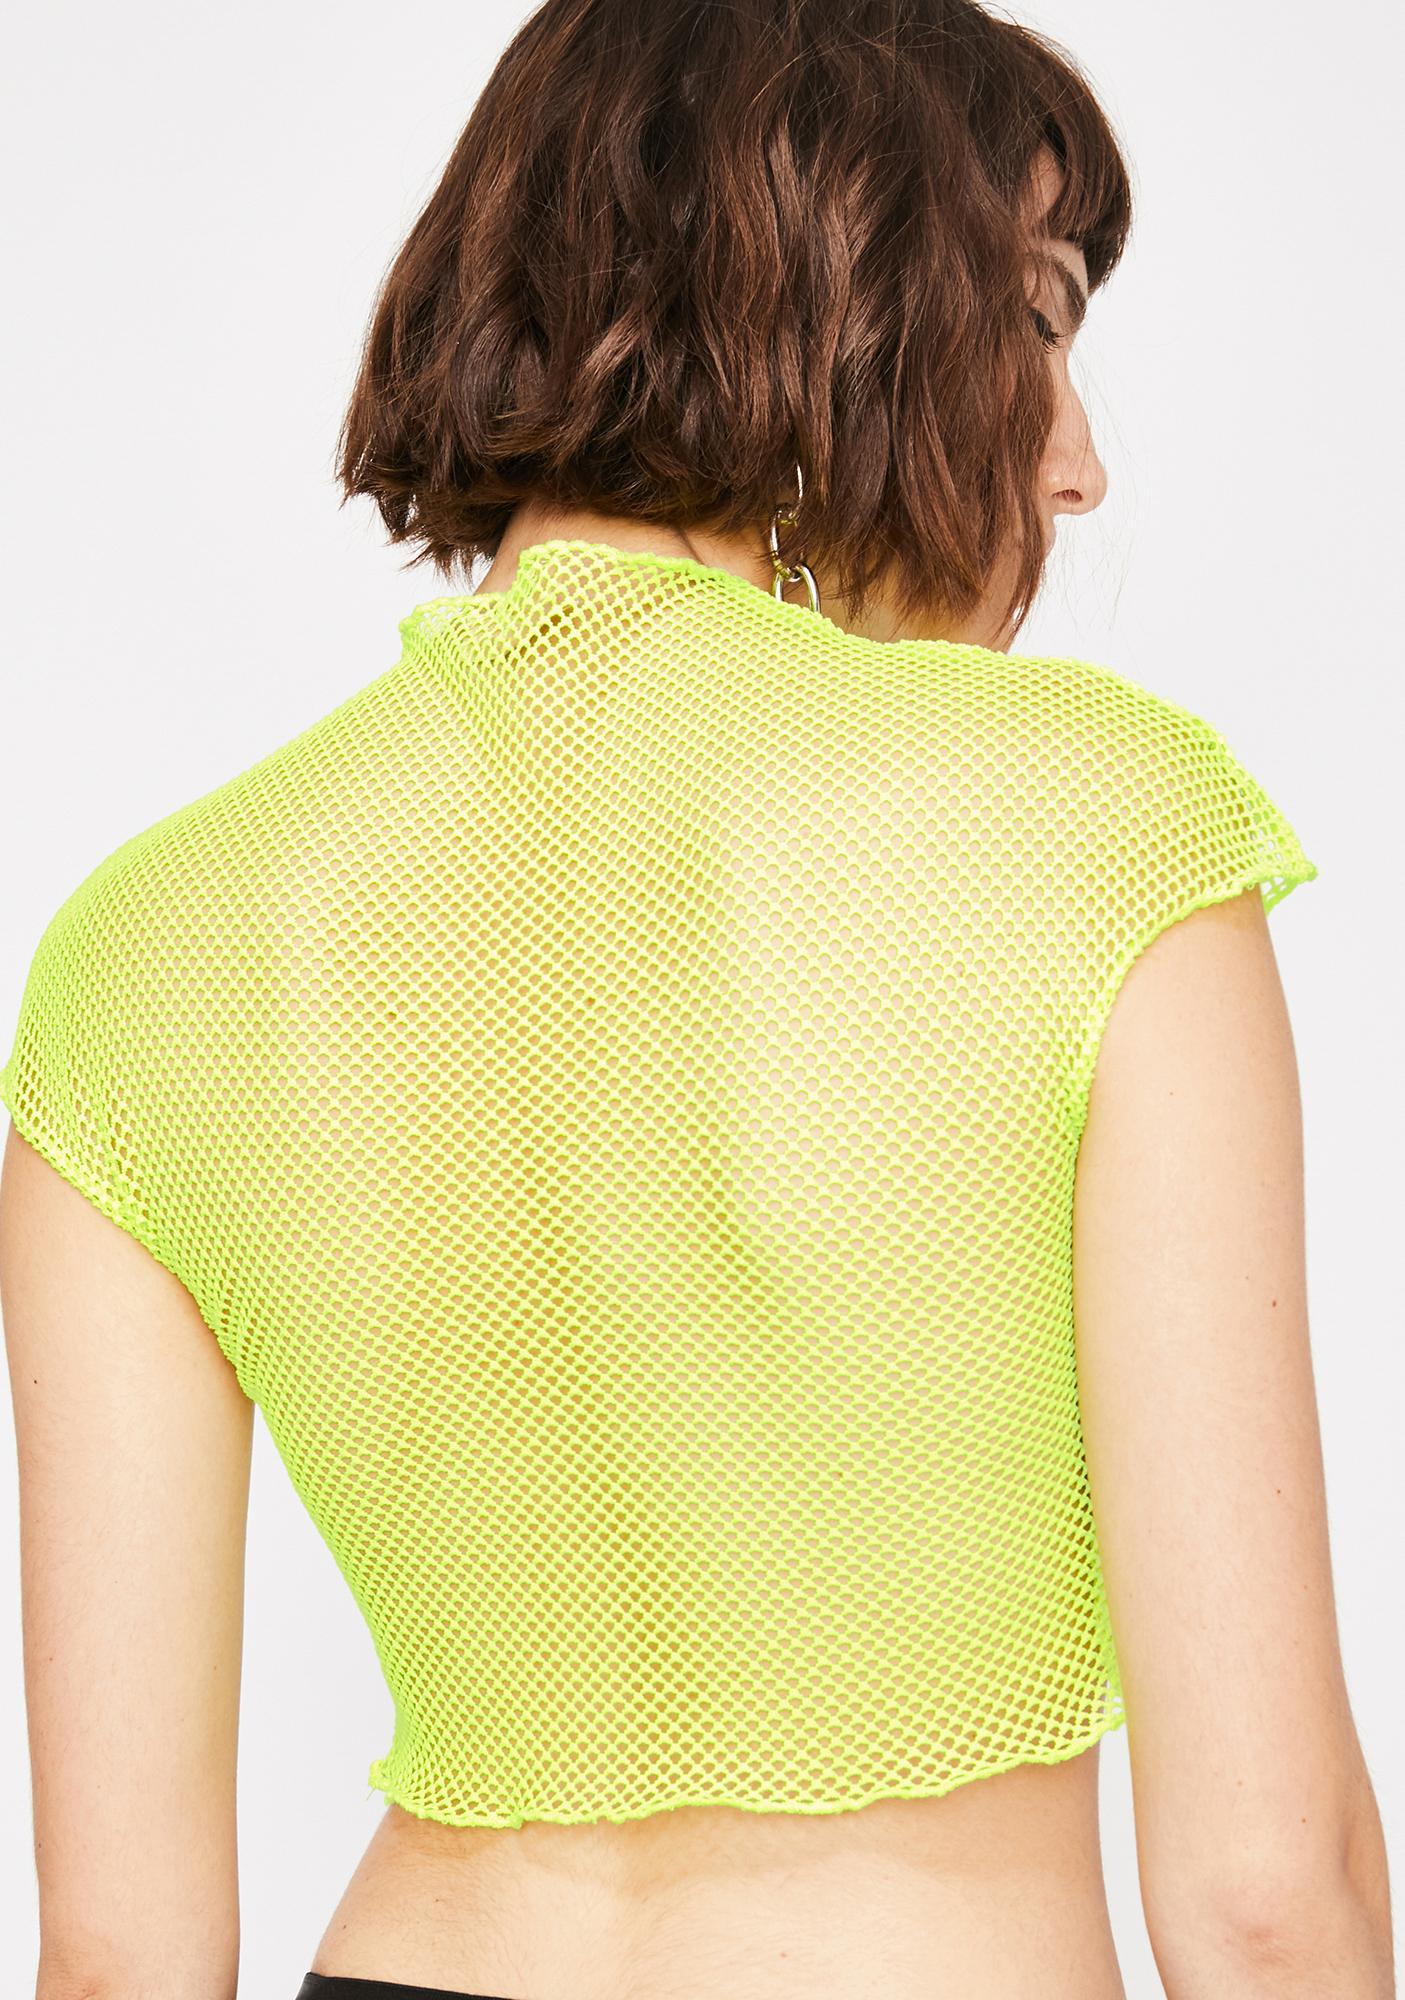 Slime Bad Romance Fishnet Crop Top